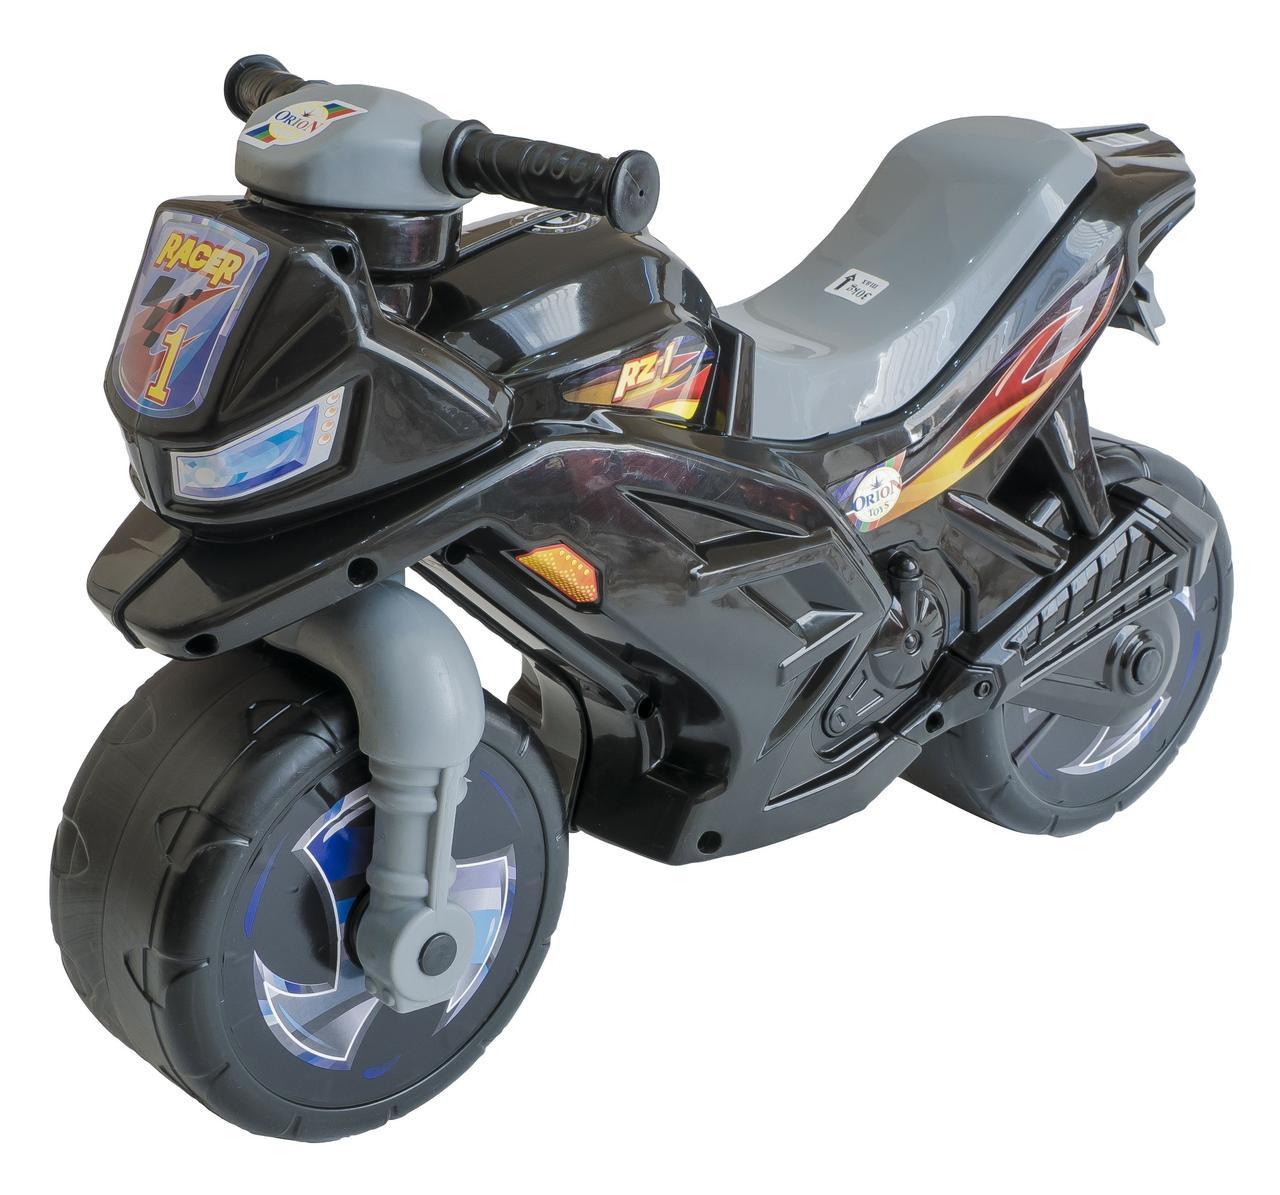 Мотоцикл черный Орион 501w